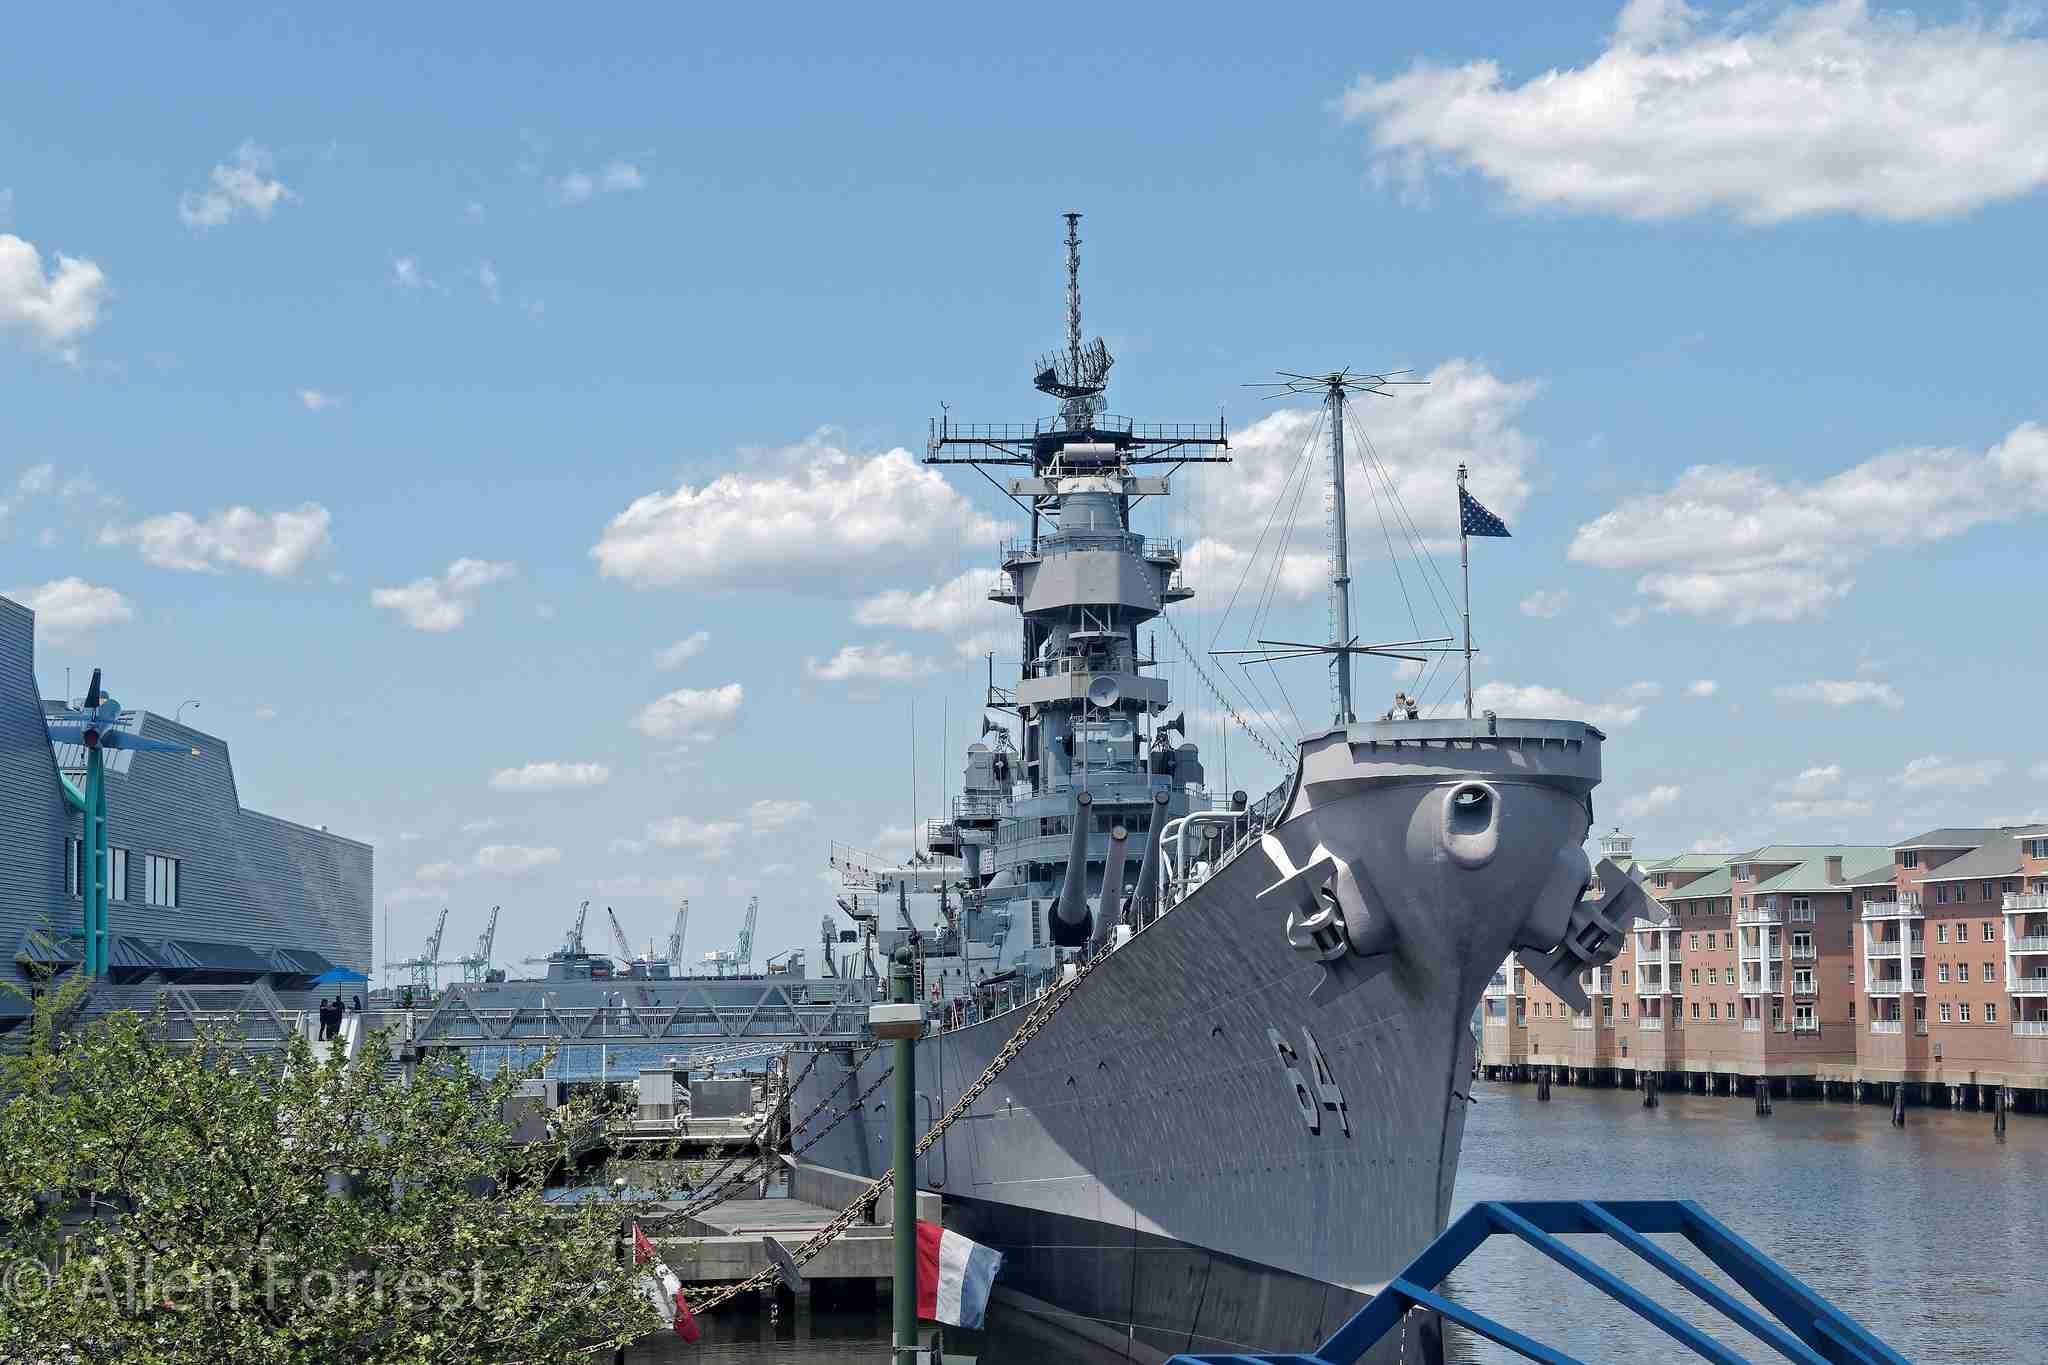 Battleship USS Wisconsin at Nauticus